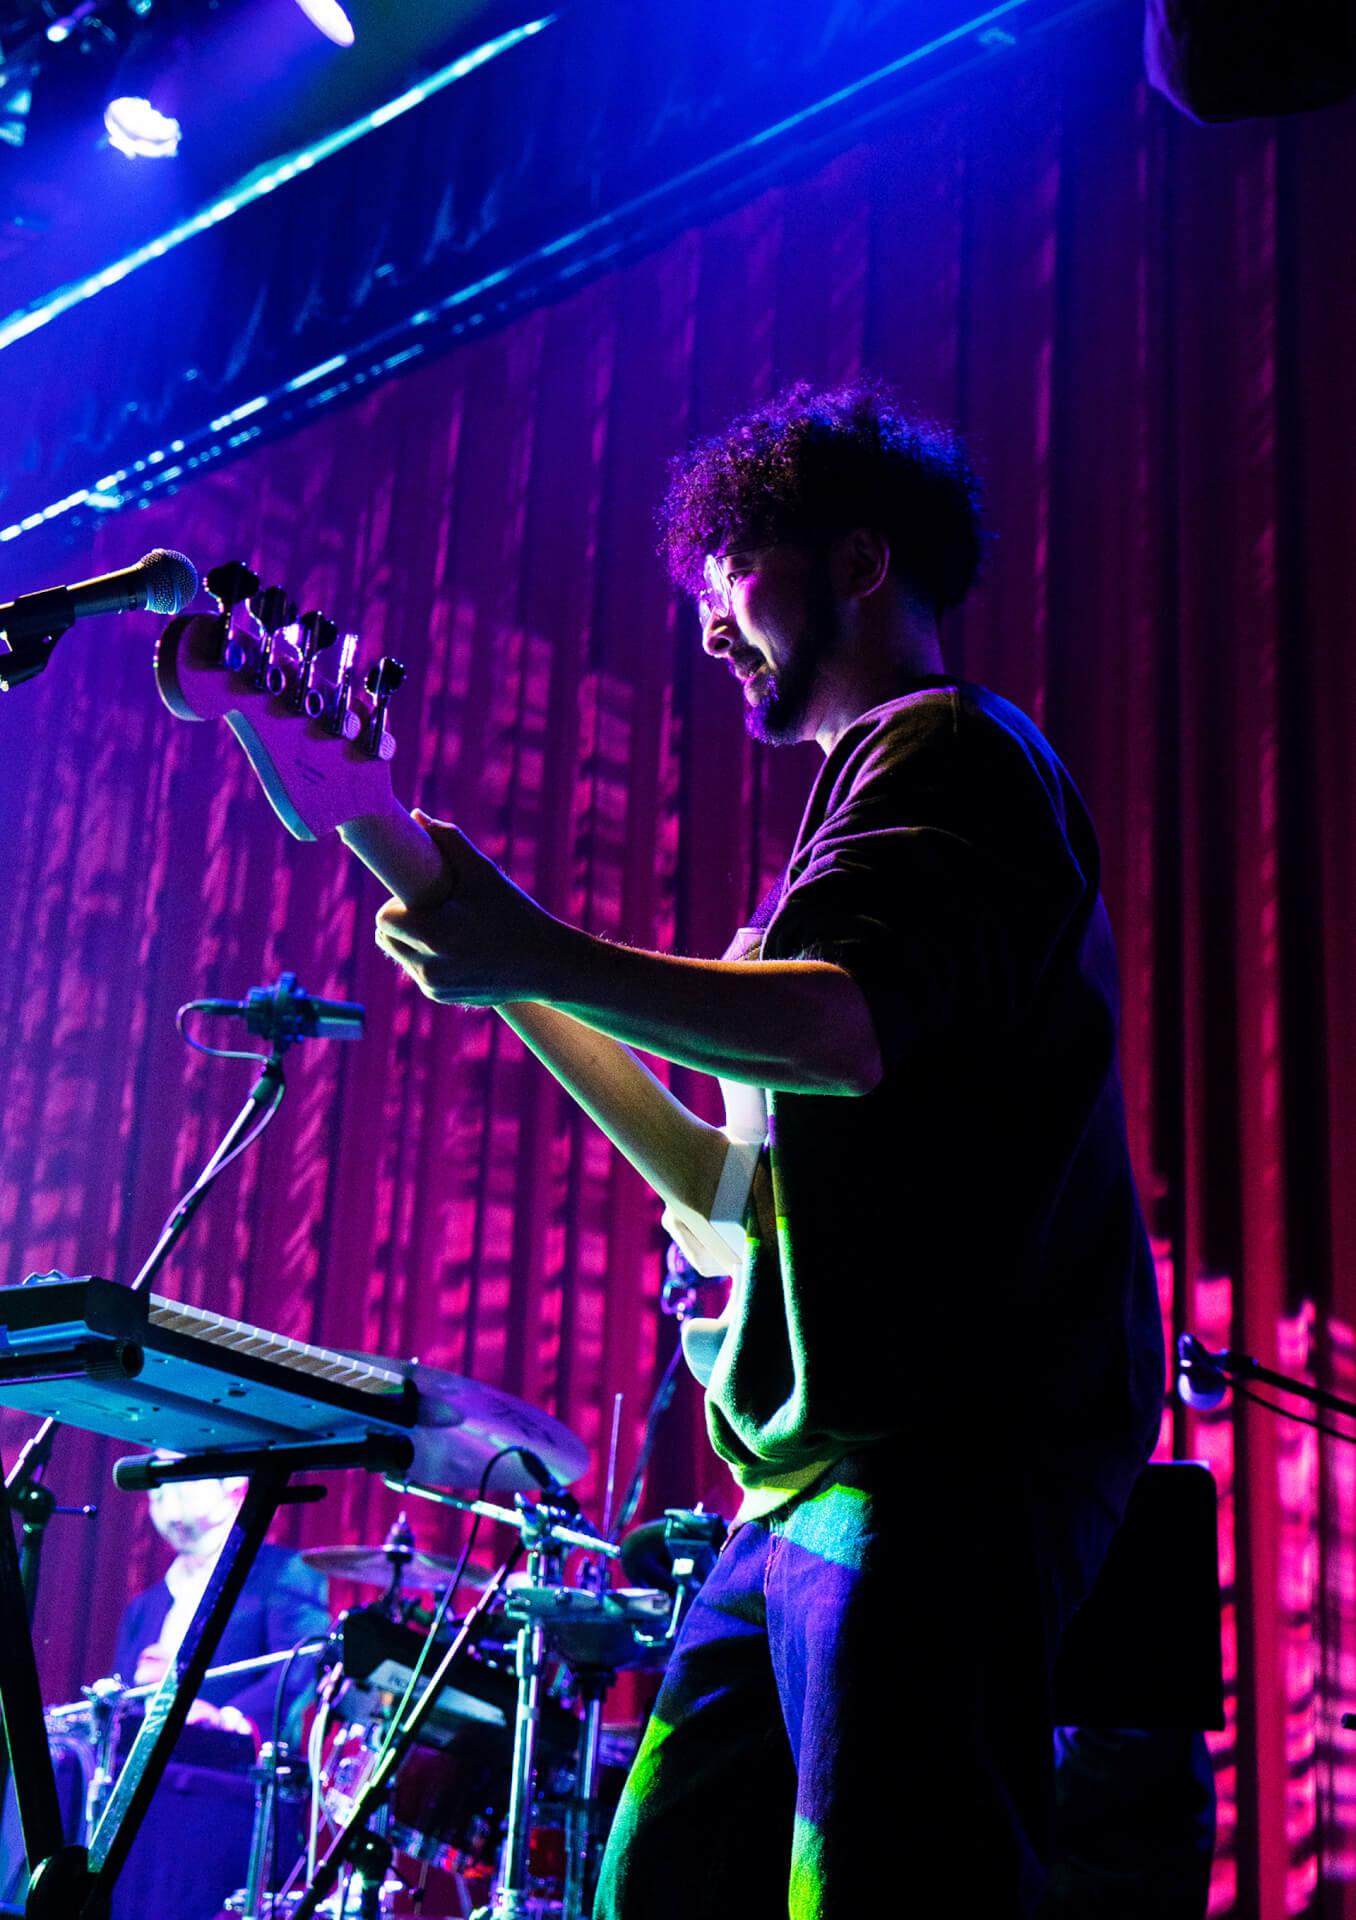 BIM初のビルボードライブ公演のライブレポートが到着!バンドセットでPUNPEE、kZm、STUTSらと共演 music201112_bim_live_3